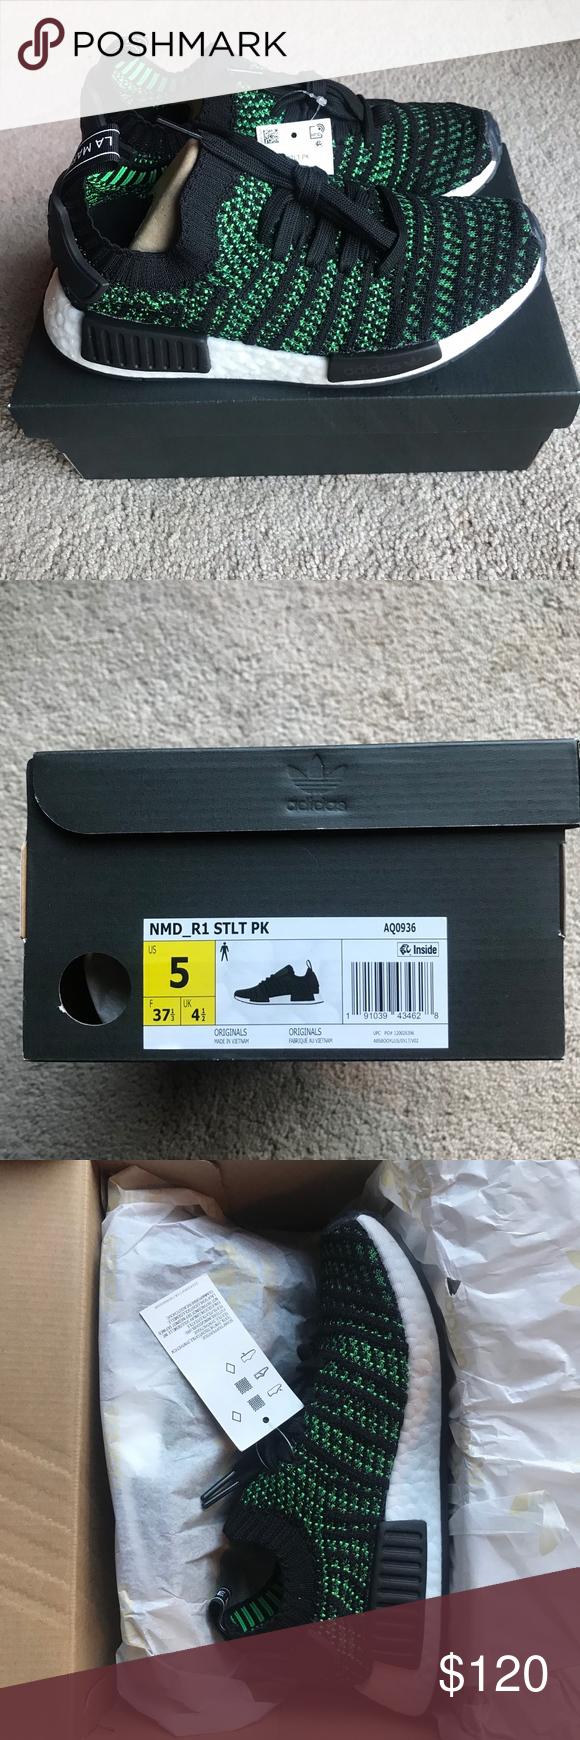 2ef830715 Adidas NMD R1 STLT Primeknit Sneakers Sz 5 Core black